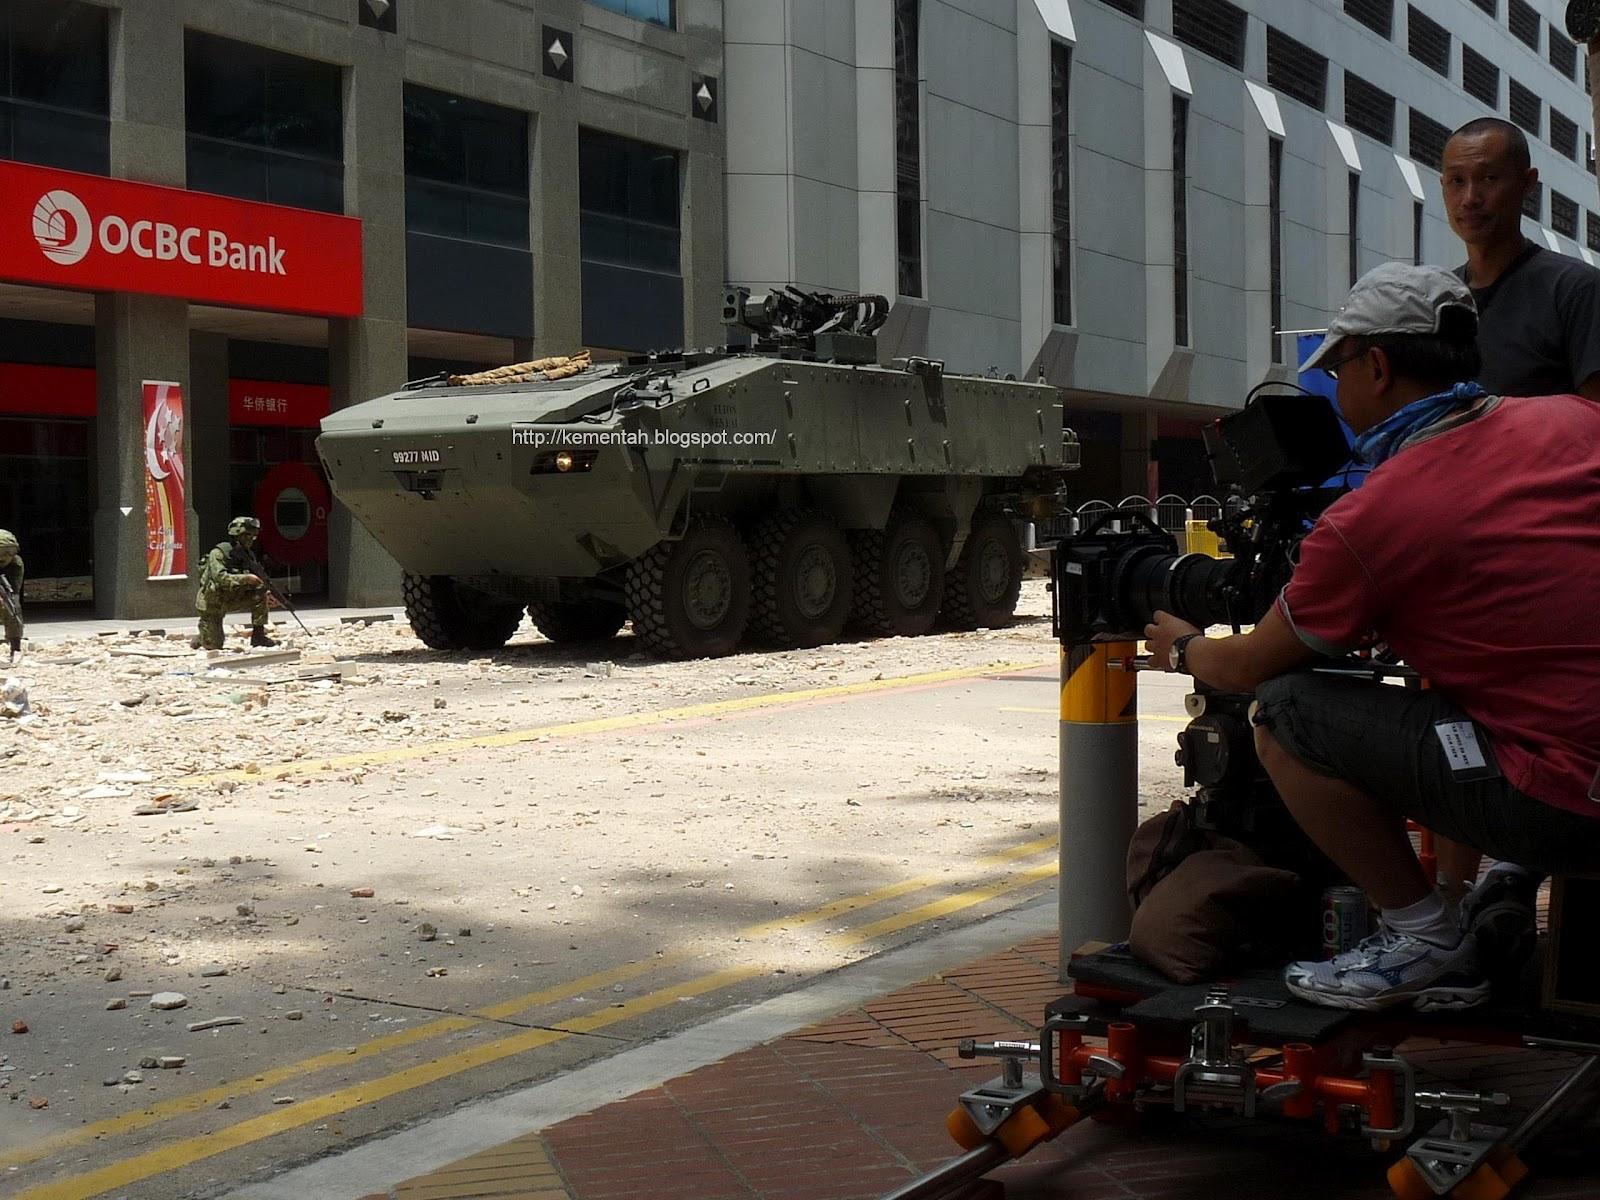 Senang Diri: Making of battle scenes for Jack Neo's upcoming movie